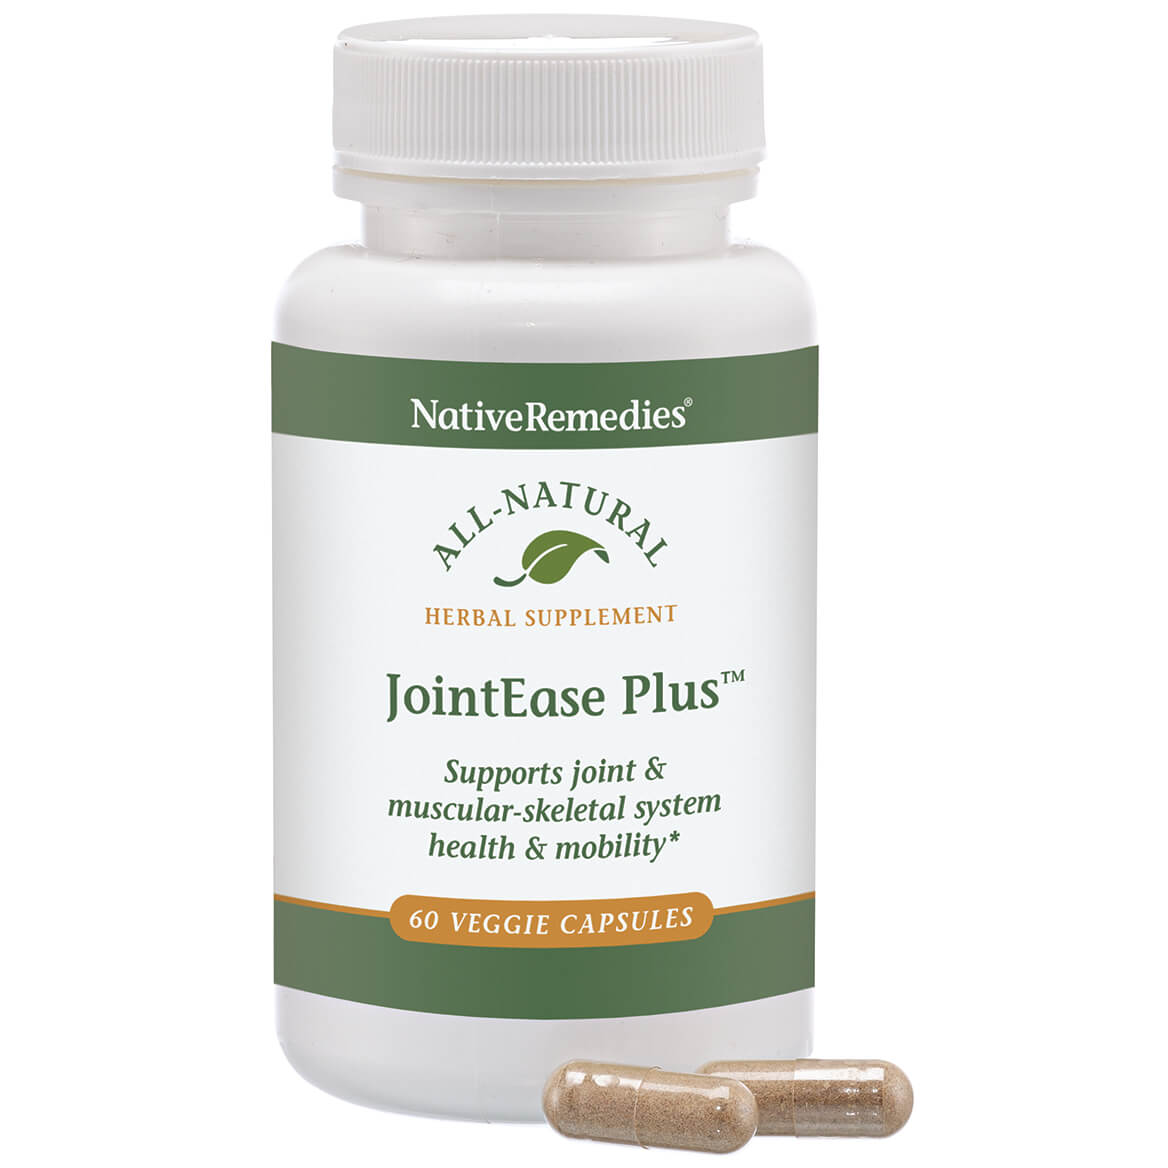 NativeRemedies® JointEase Plus™-351026